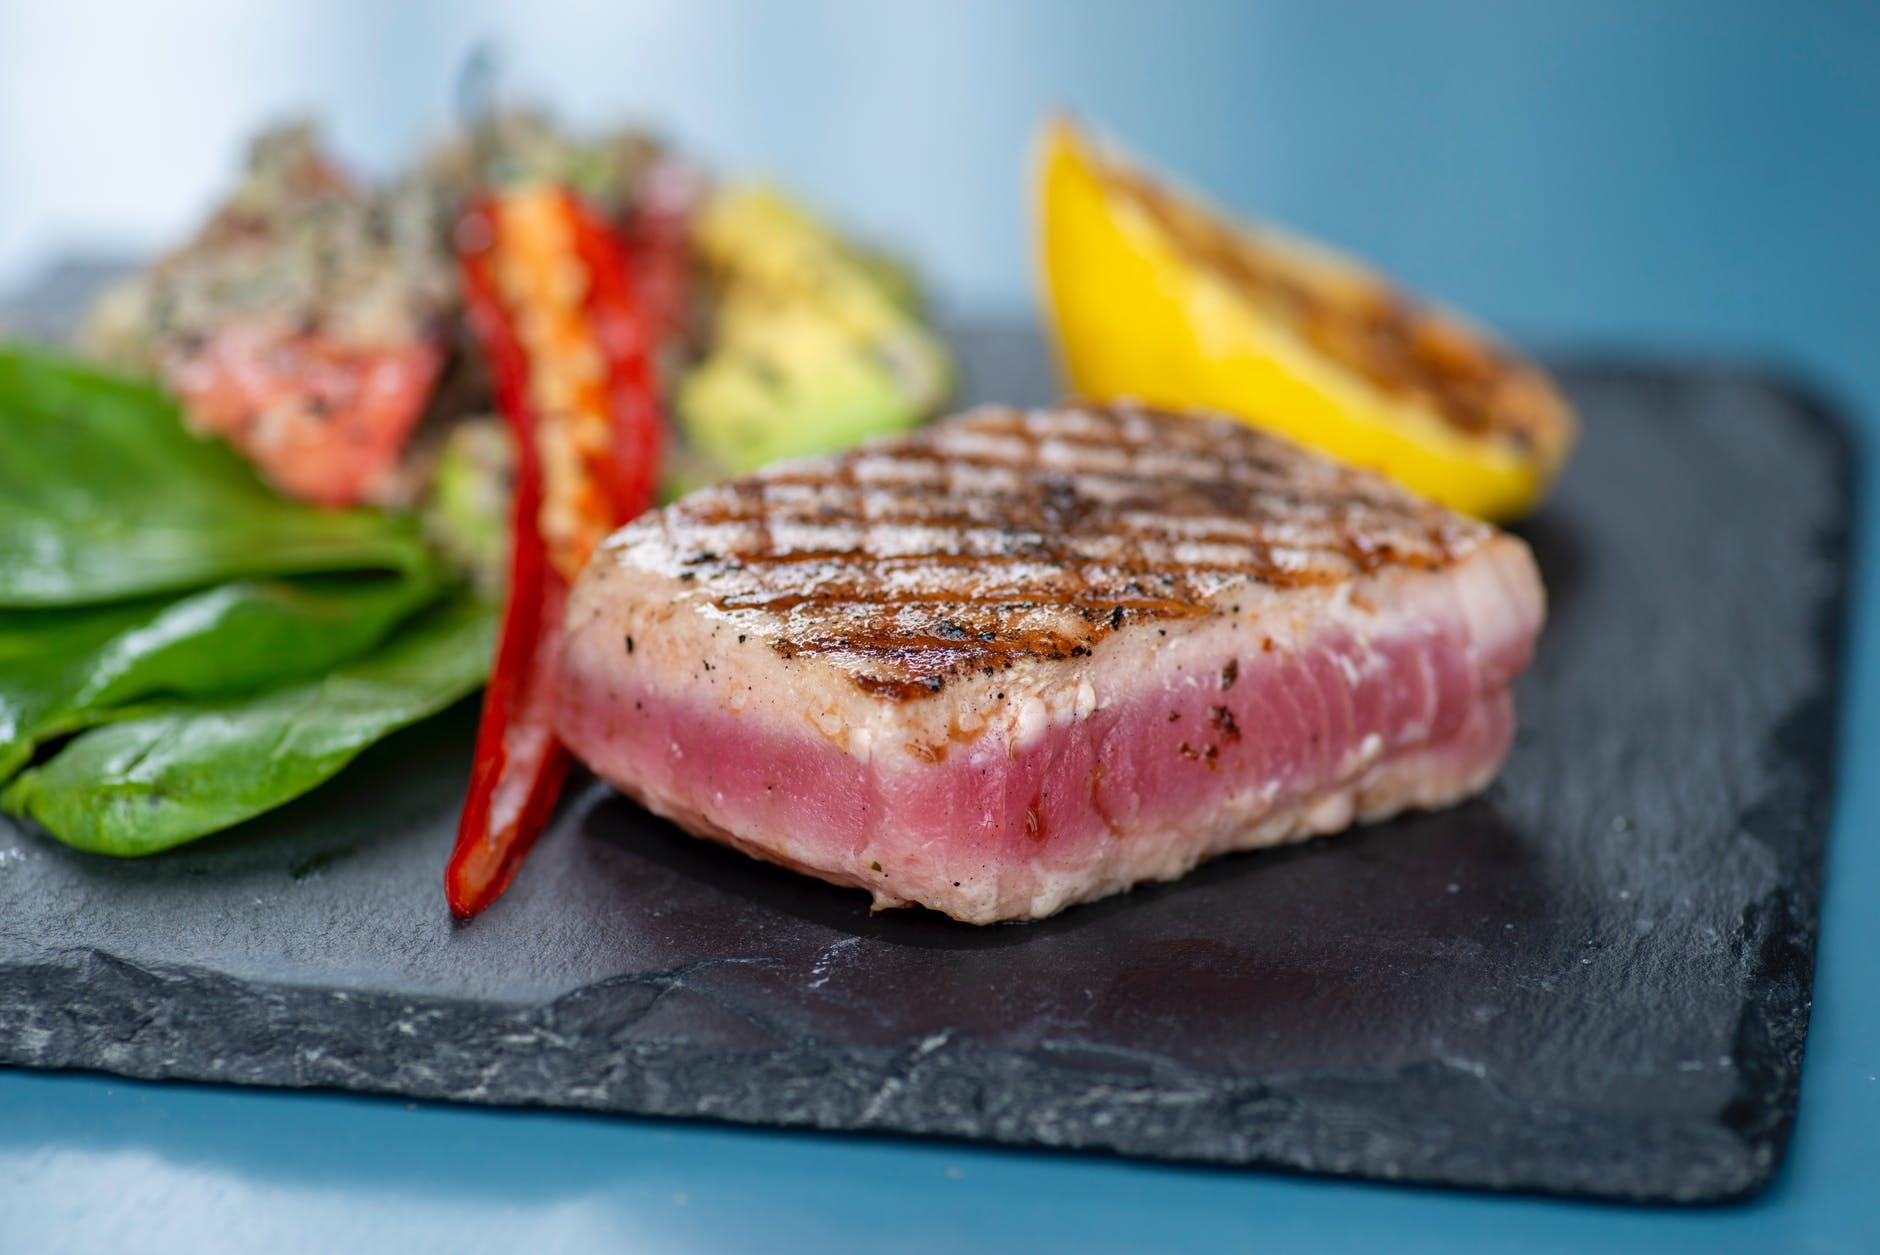 food dinner lunch steak